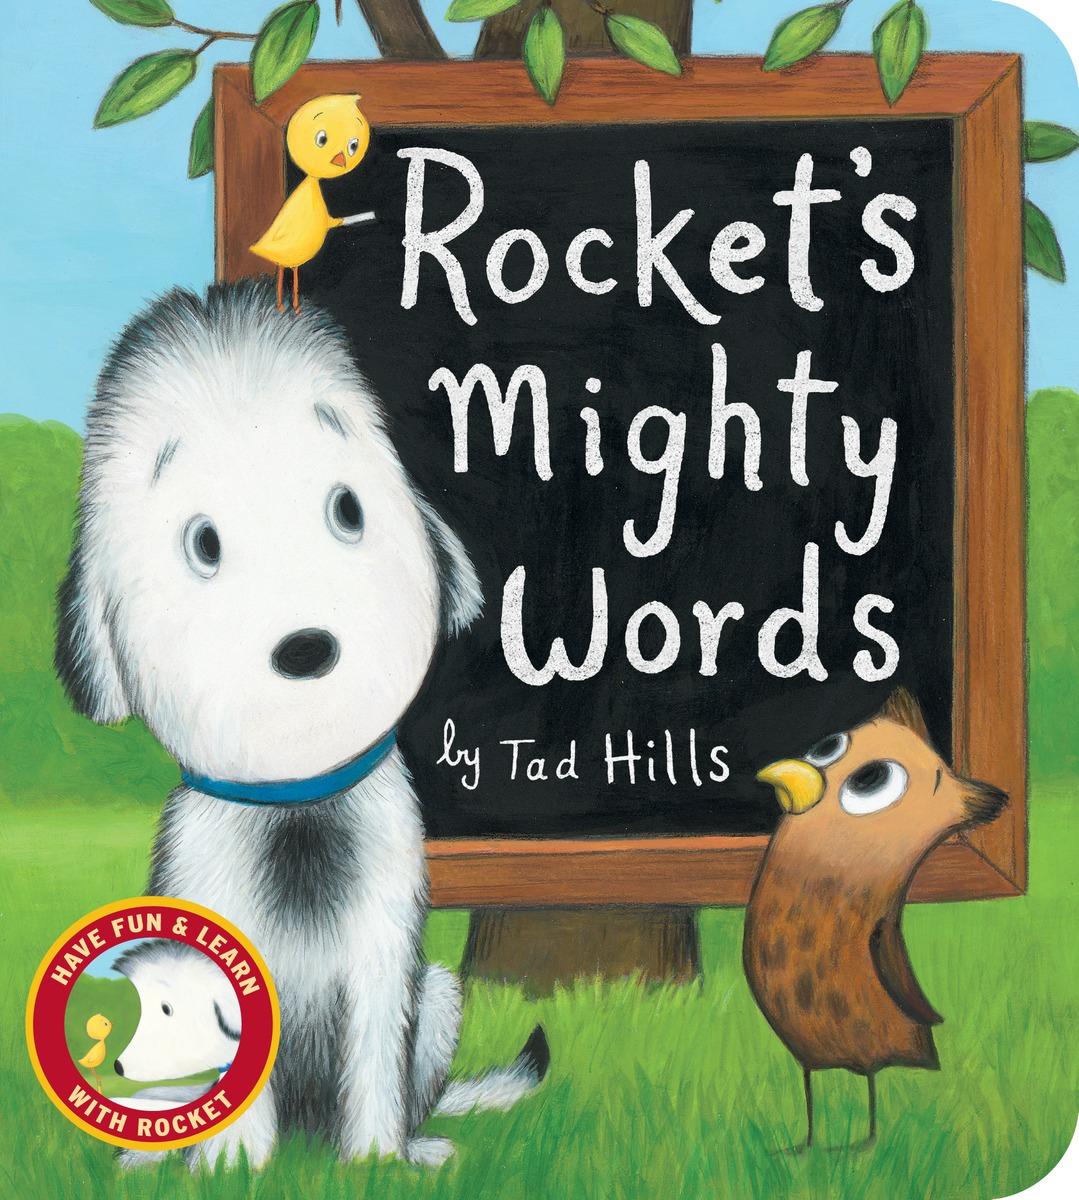 ROCKET'S MIGHTY WORDS key words 2c i like to write